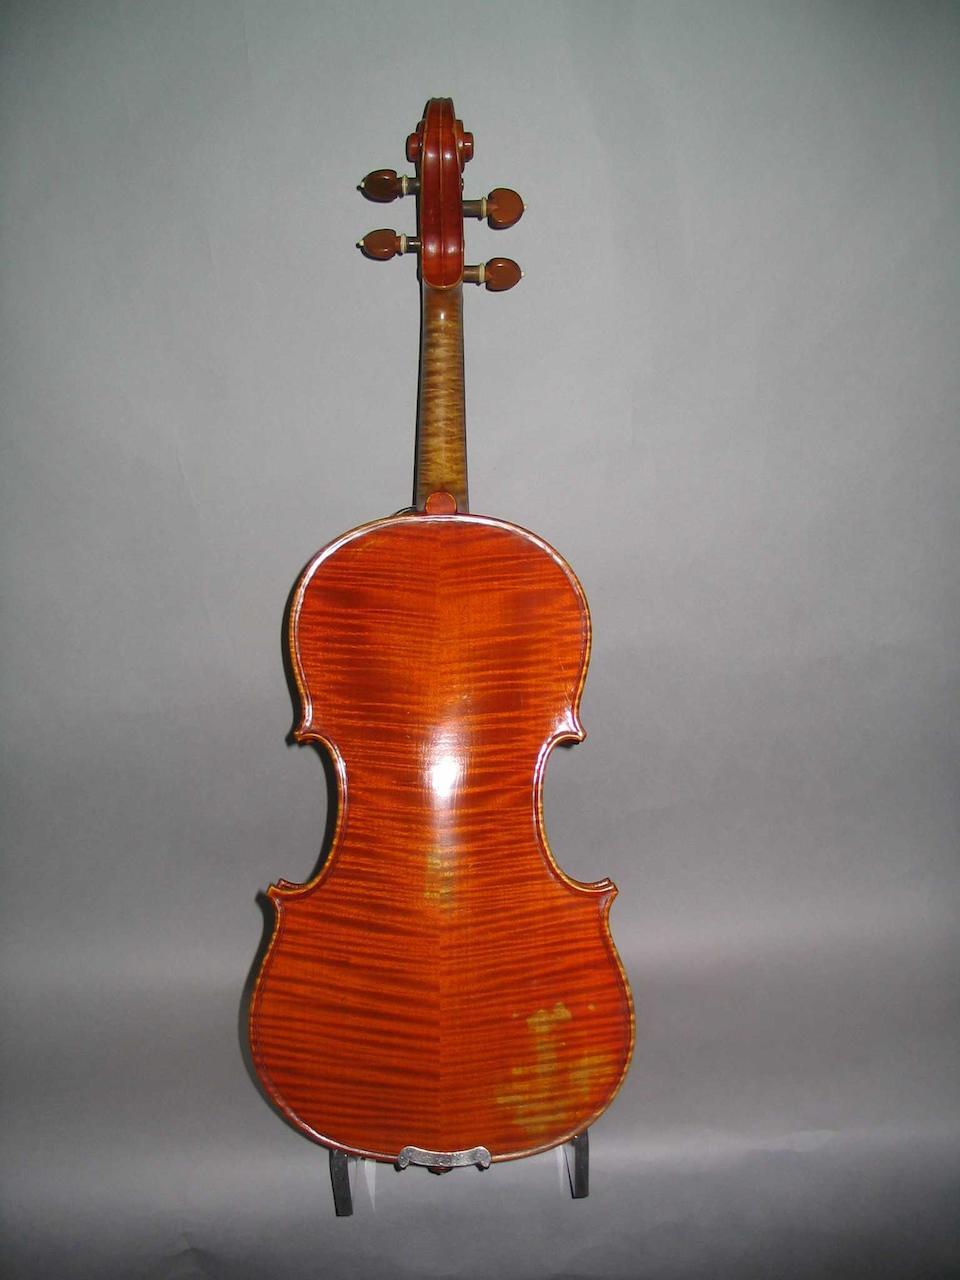 A good contemporary Violin